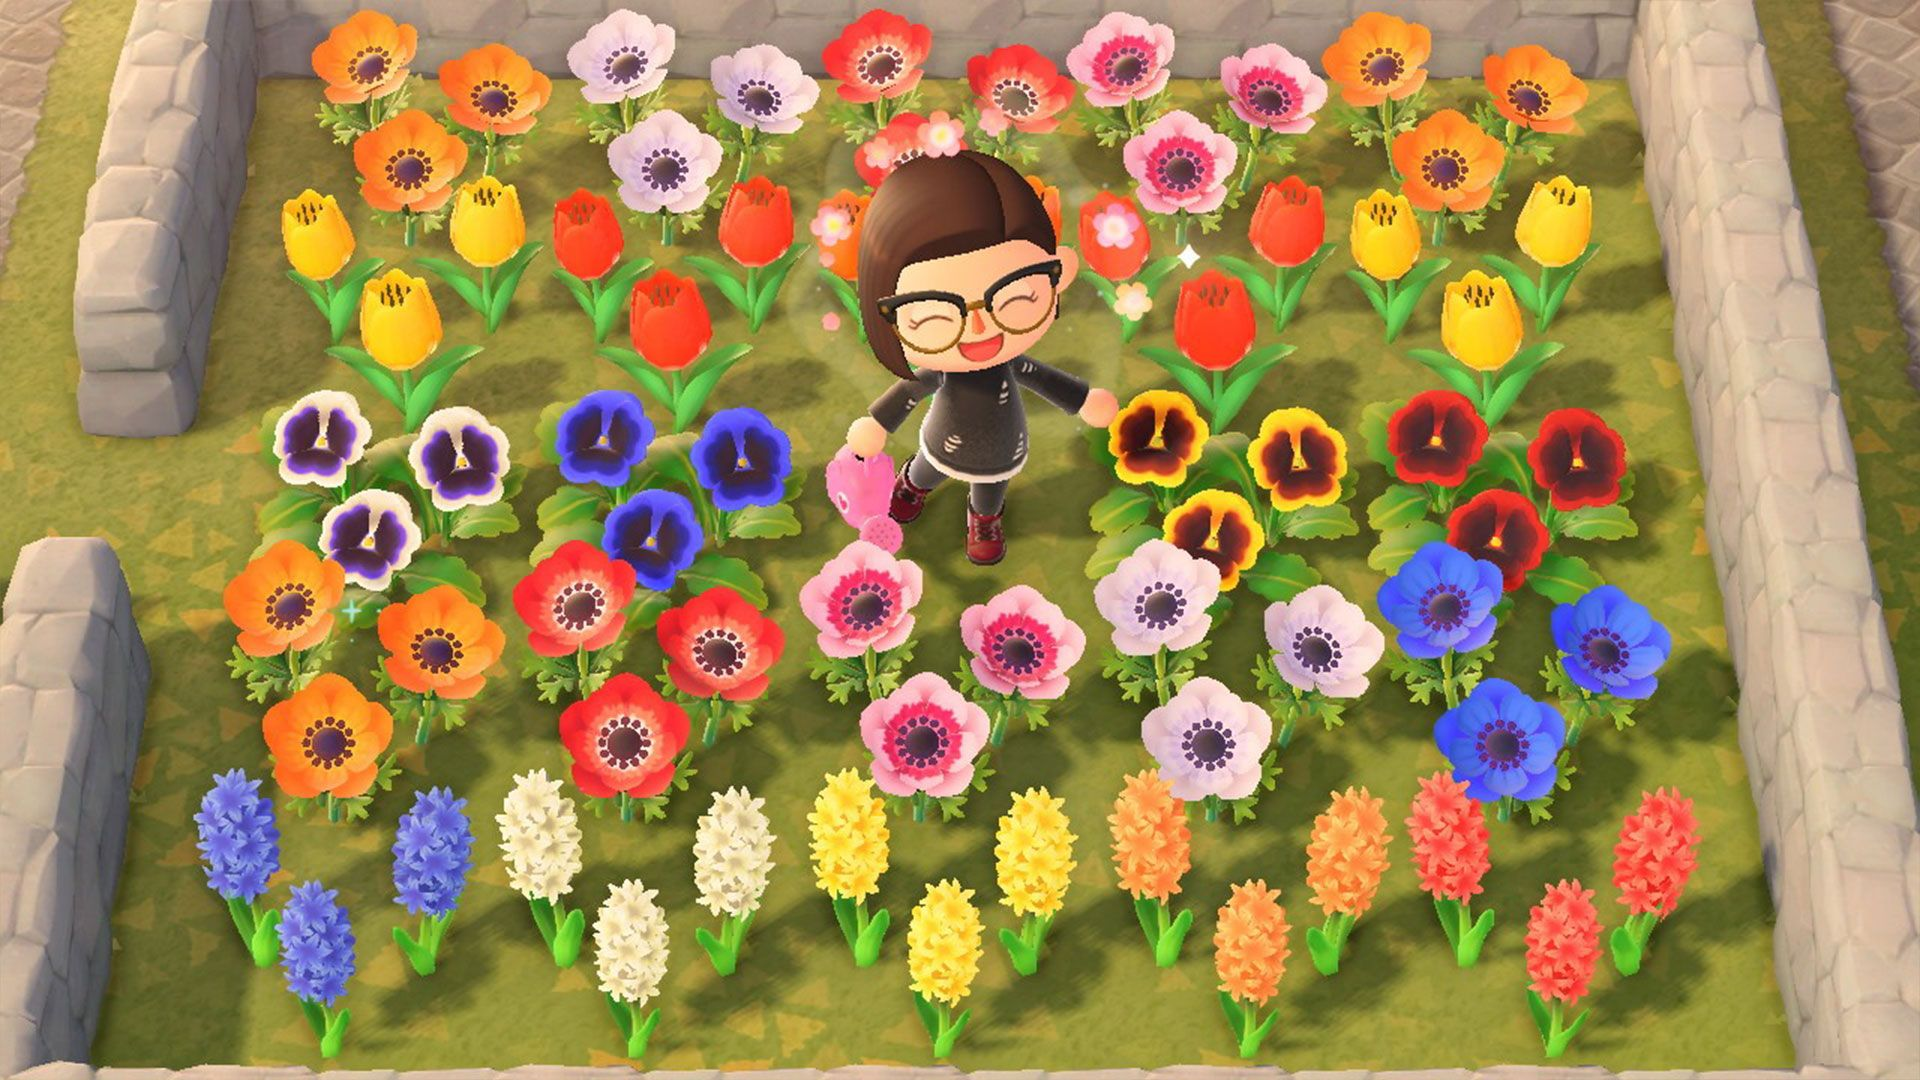 How To Create Hybrid Flowers In Animal Crossing New Horizons In 2020 Animal Crossing Types Of Flowers Grow Animals